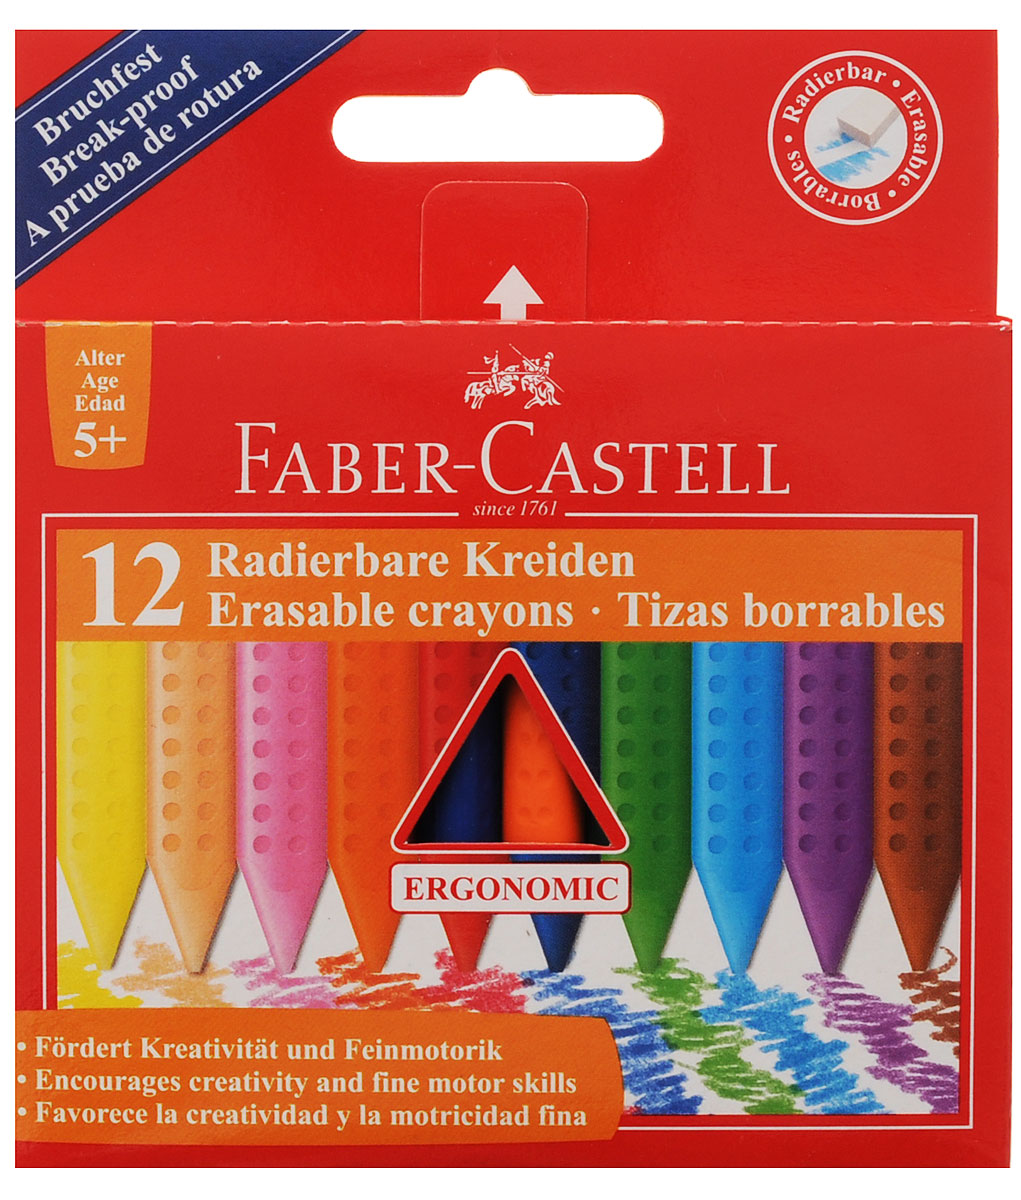 Faber-Castell Восковые мелки Radierbare Kreiden стирающиеся 12 цветов карандаши восковые мелки пастель giotto мелки восковые мелки cera ast 24 цвета